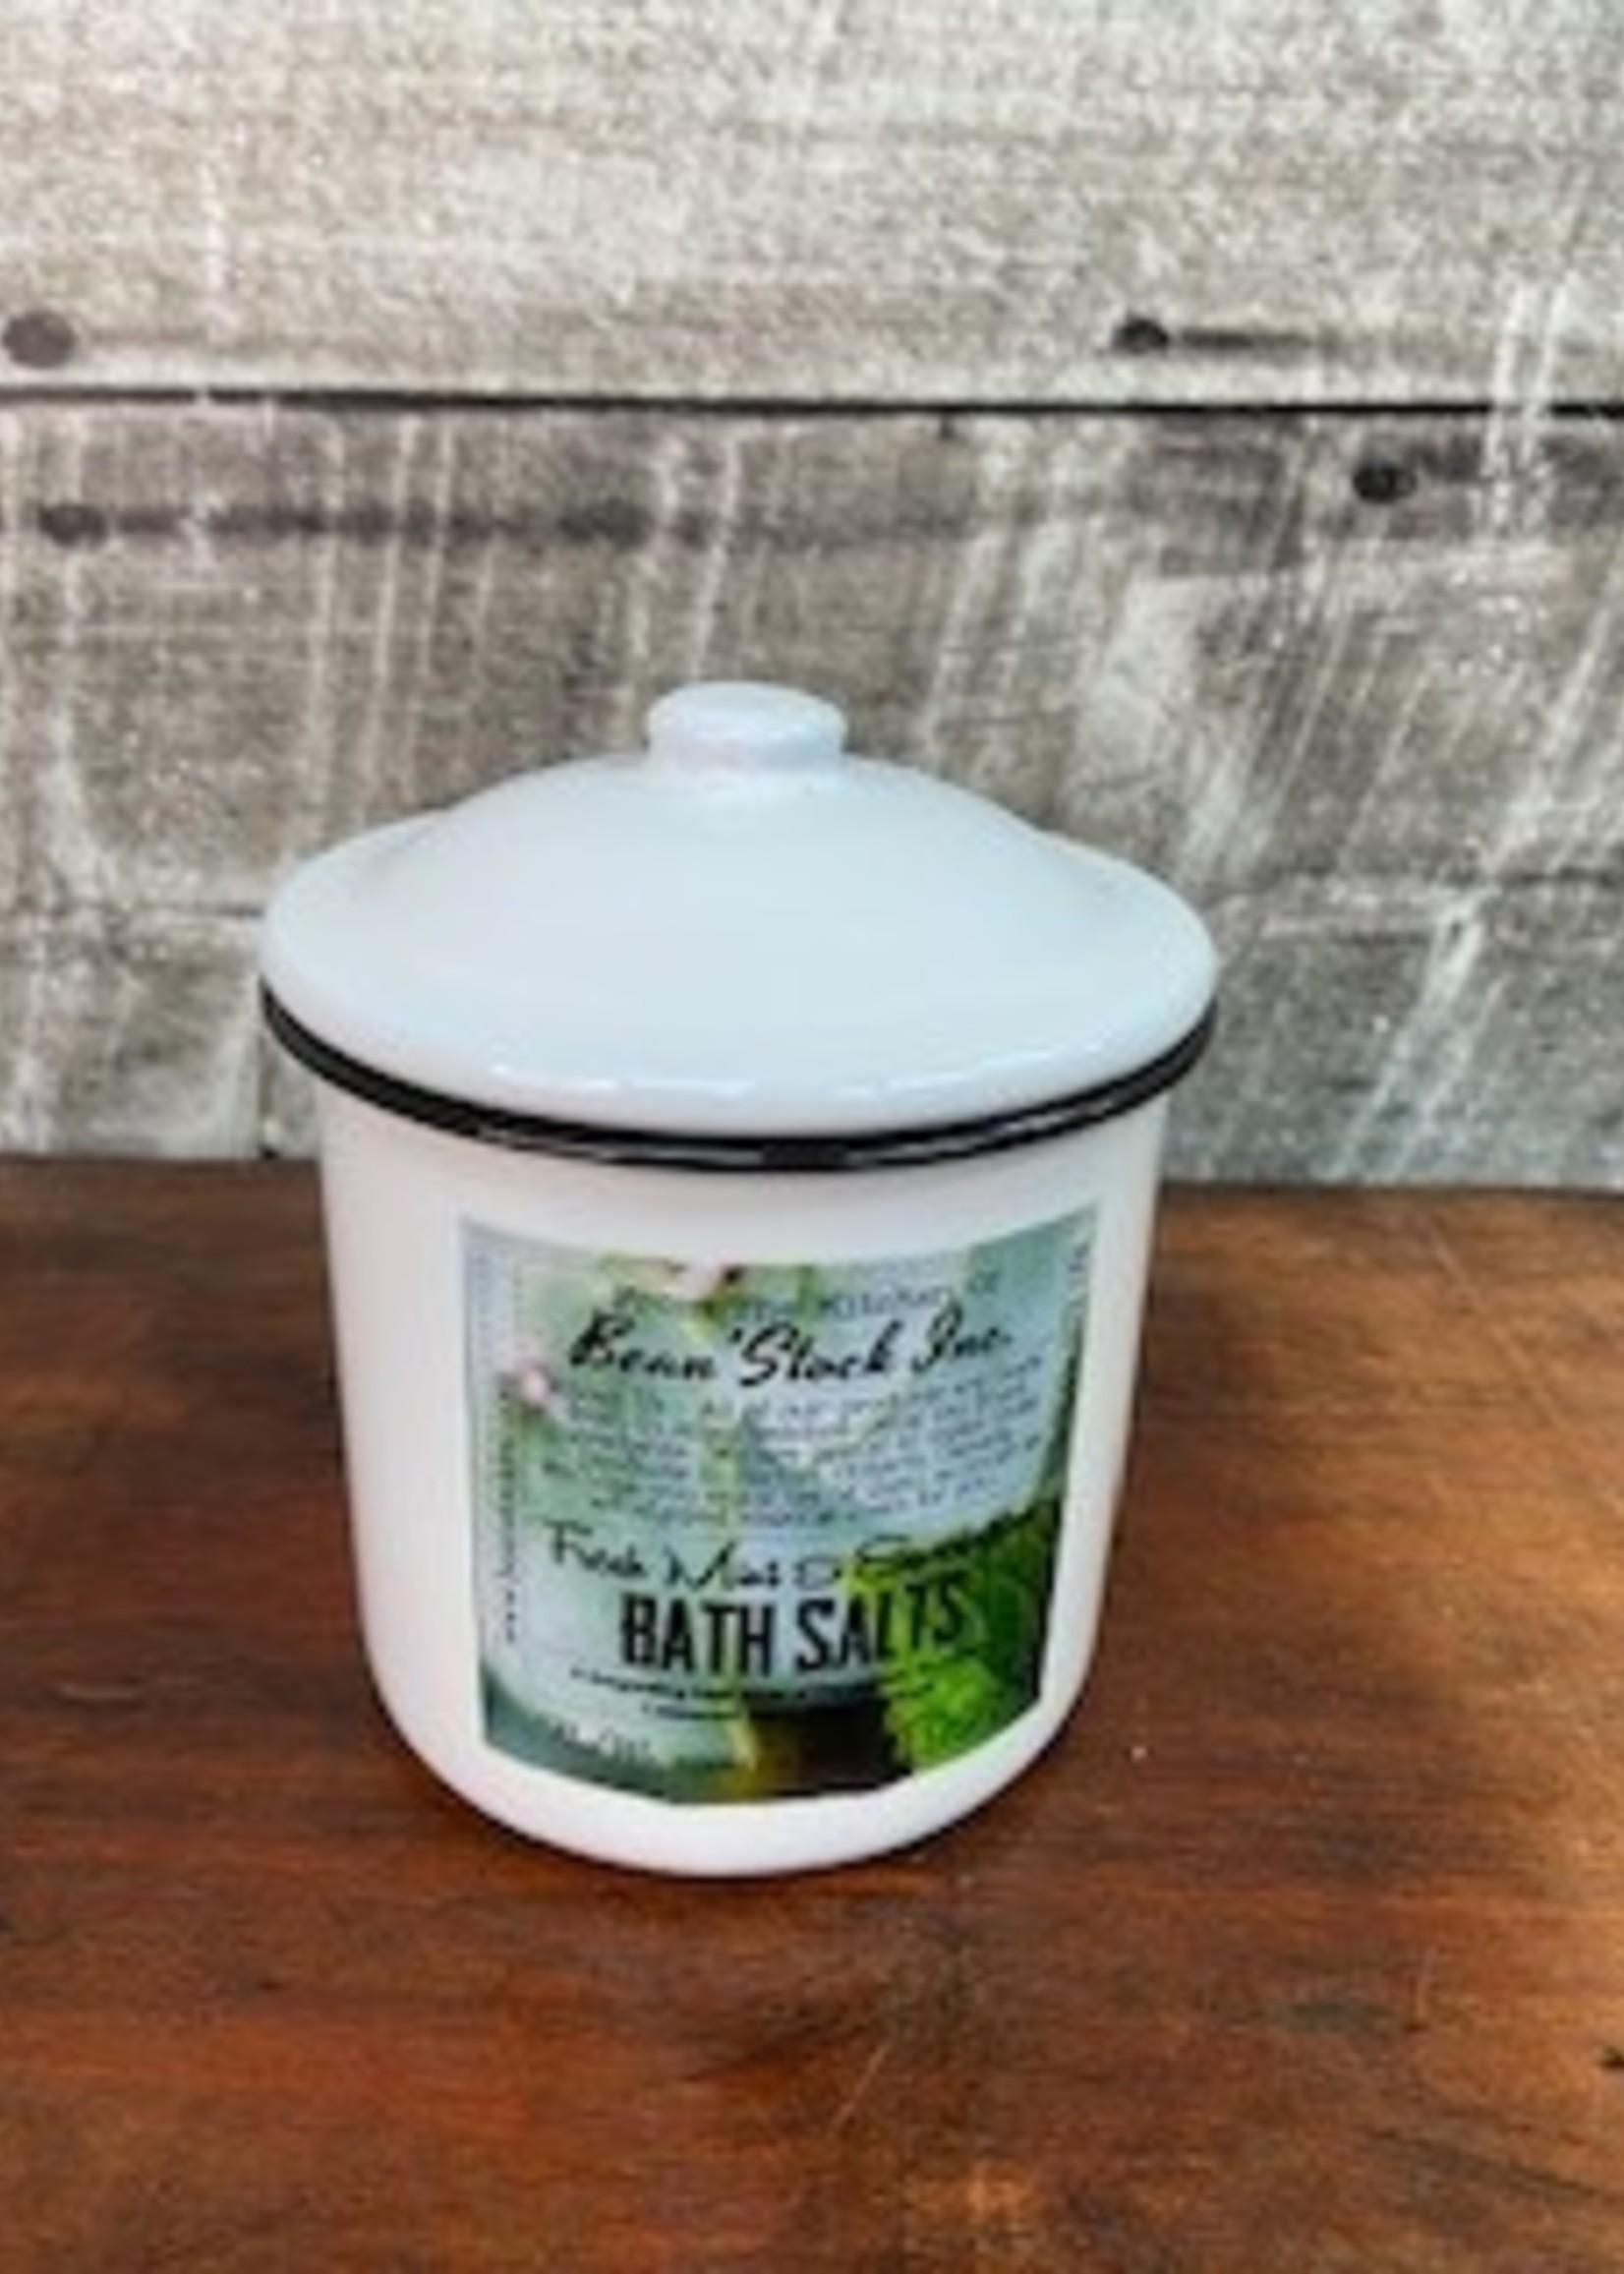 Bean stock Bath Salts Enamelware - Fresh Mint & Eucalyptus